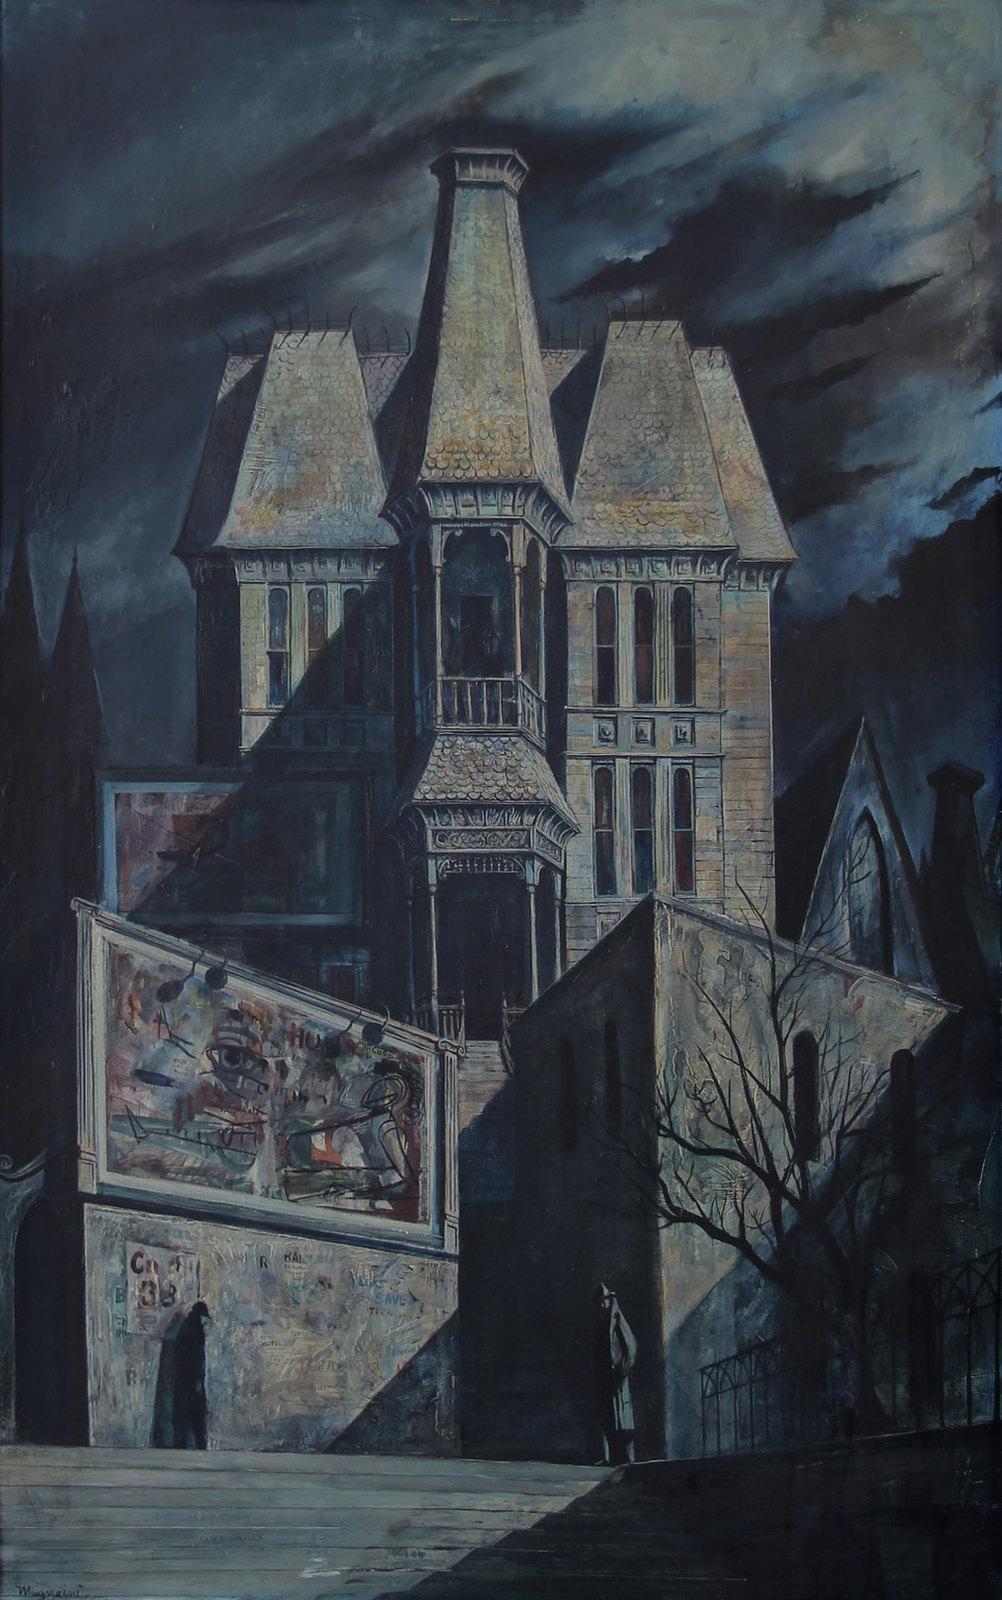 Joseph Mugnaini - Modern Gothic,  1952